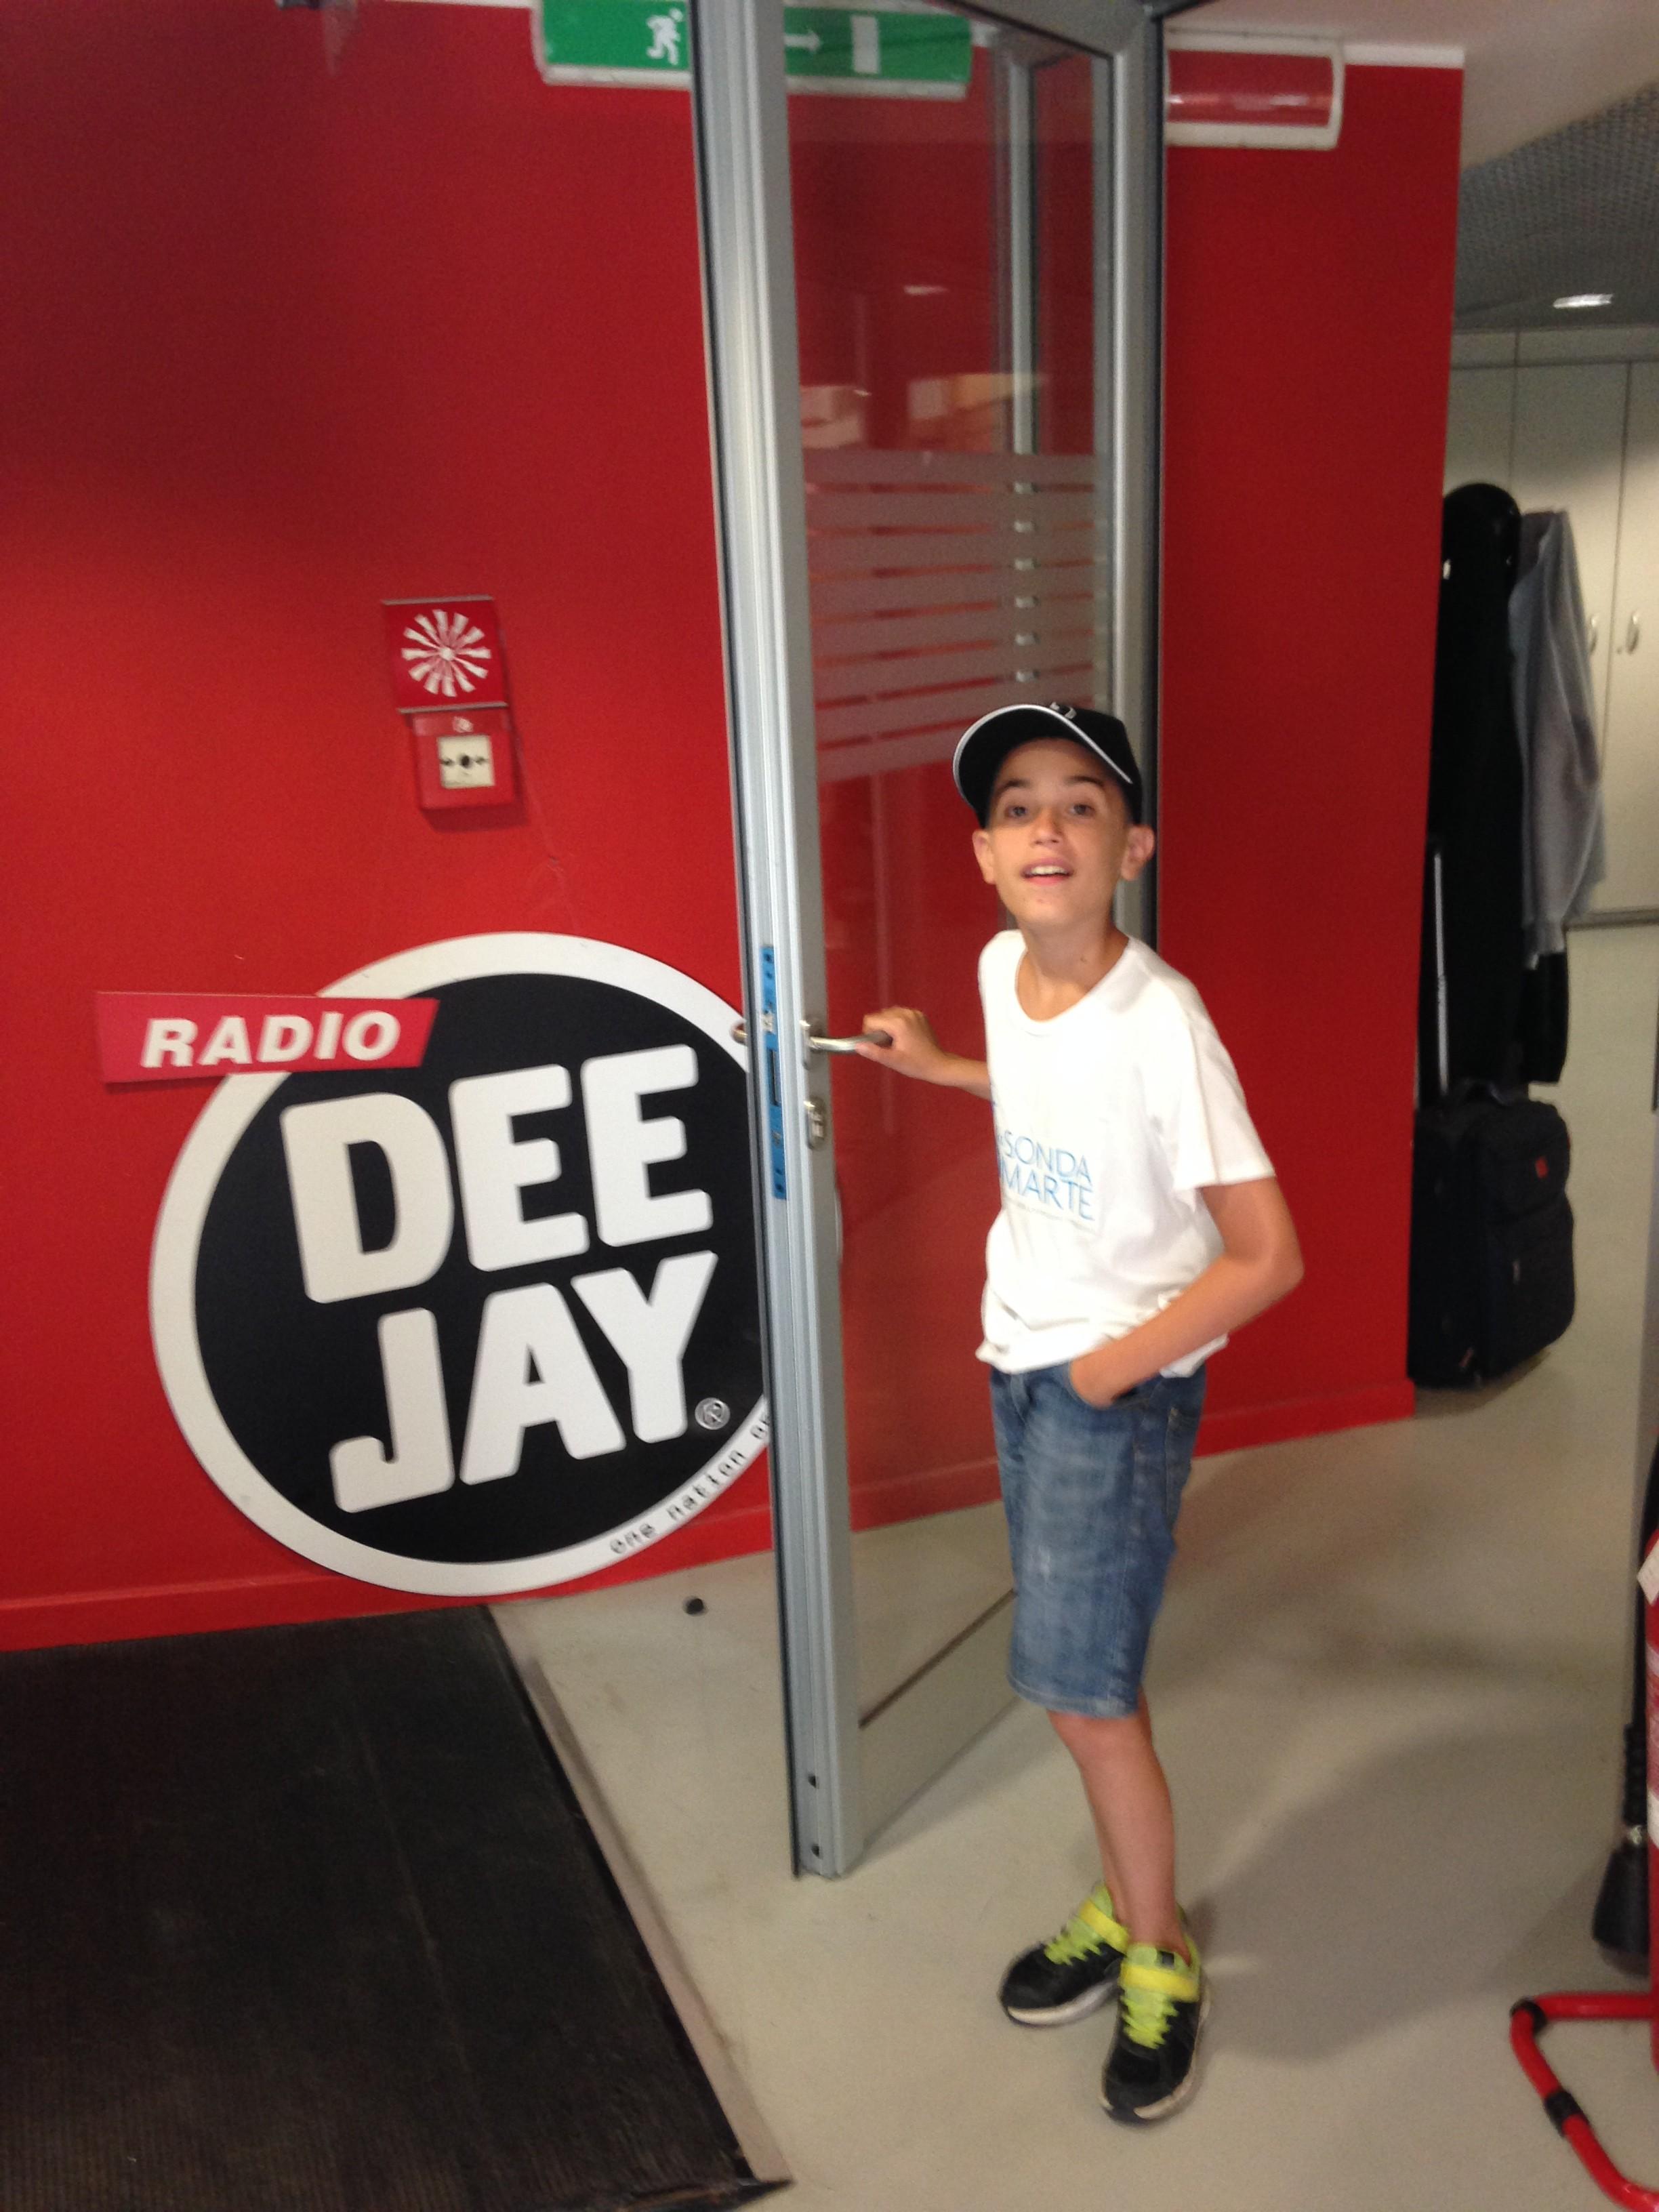 deejay13